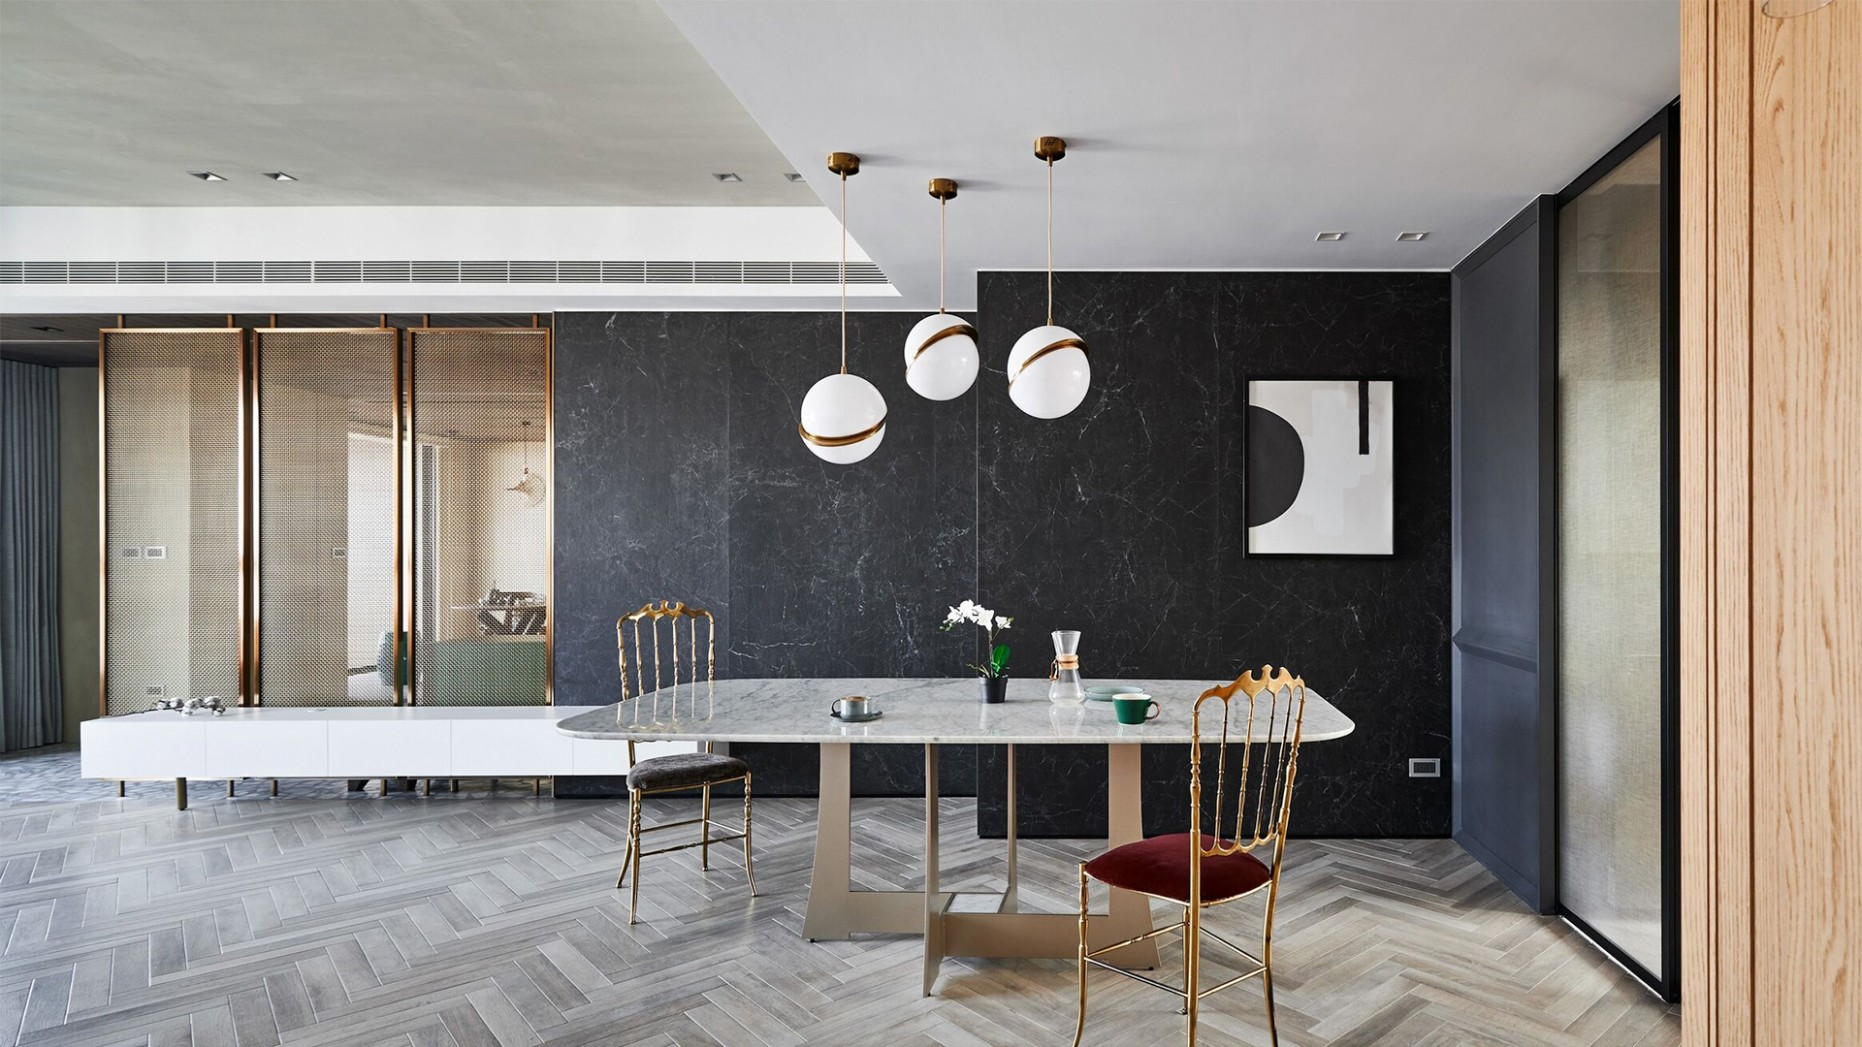 Art Meets Design I Top Trends 11 - TrendBook Trend Forecasting - Apartment Design Trends 2021